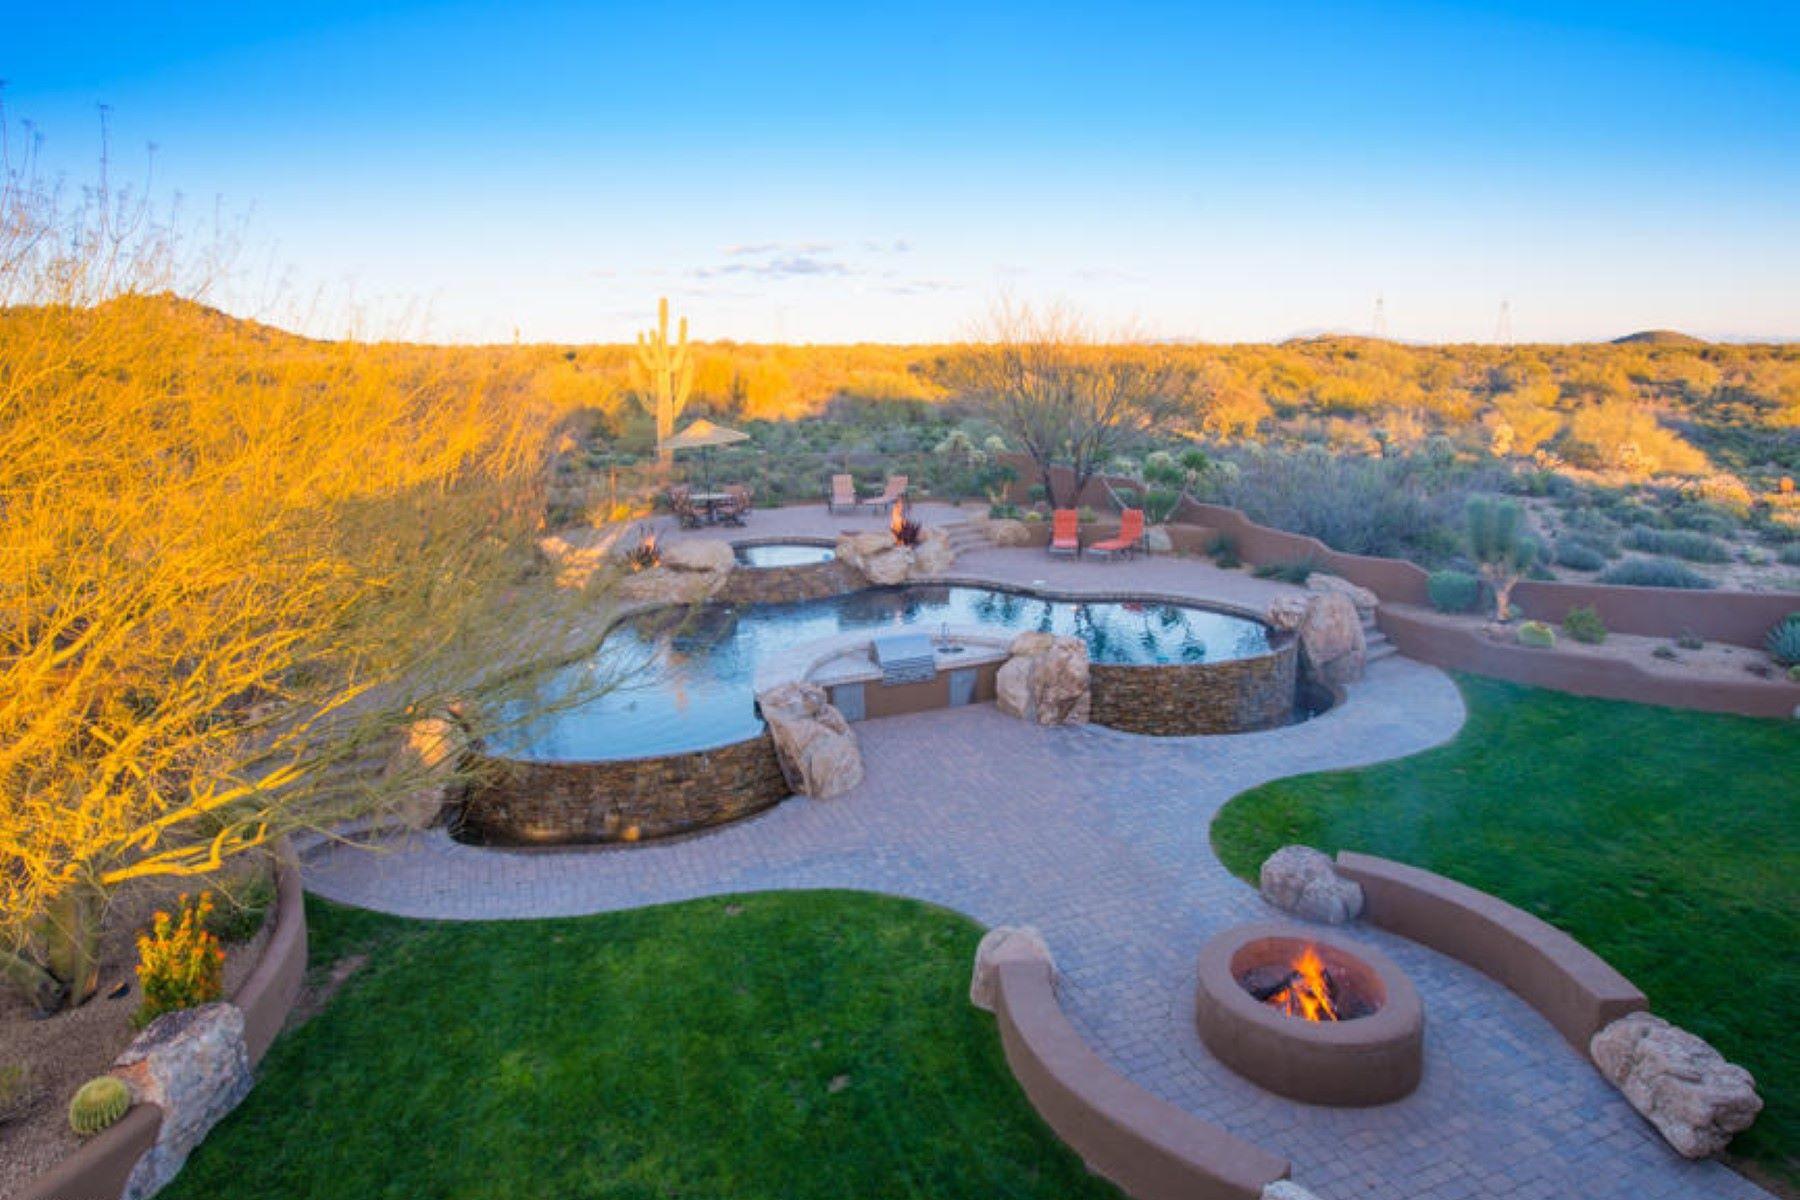 Частный односемейный дом для того Продажа на Immaculate custom home in Vista Valle community of North Scottsdale 37935 N Boulder View Drive Scottsdale, Аризона, 85262 Соединенные Штаты